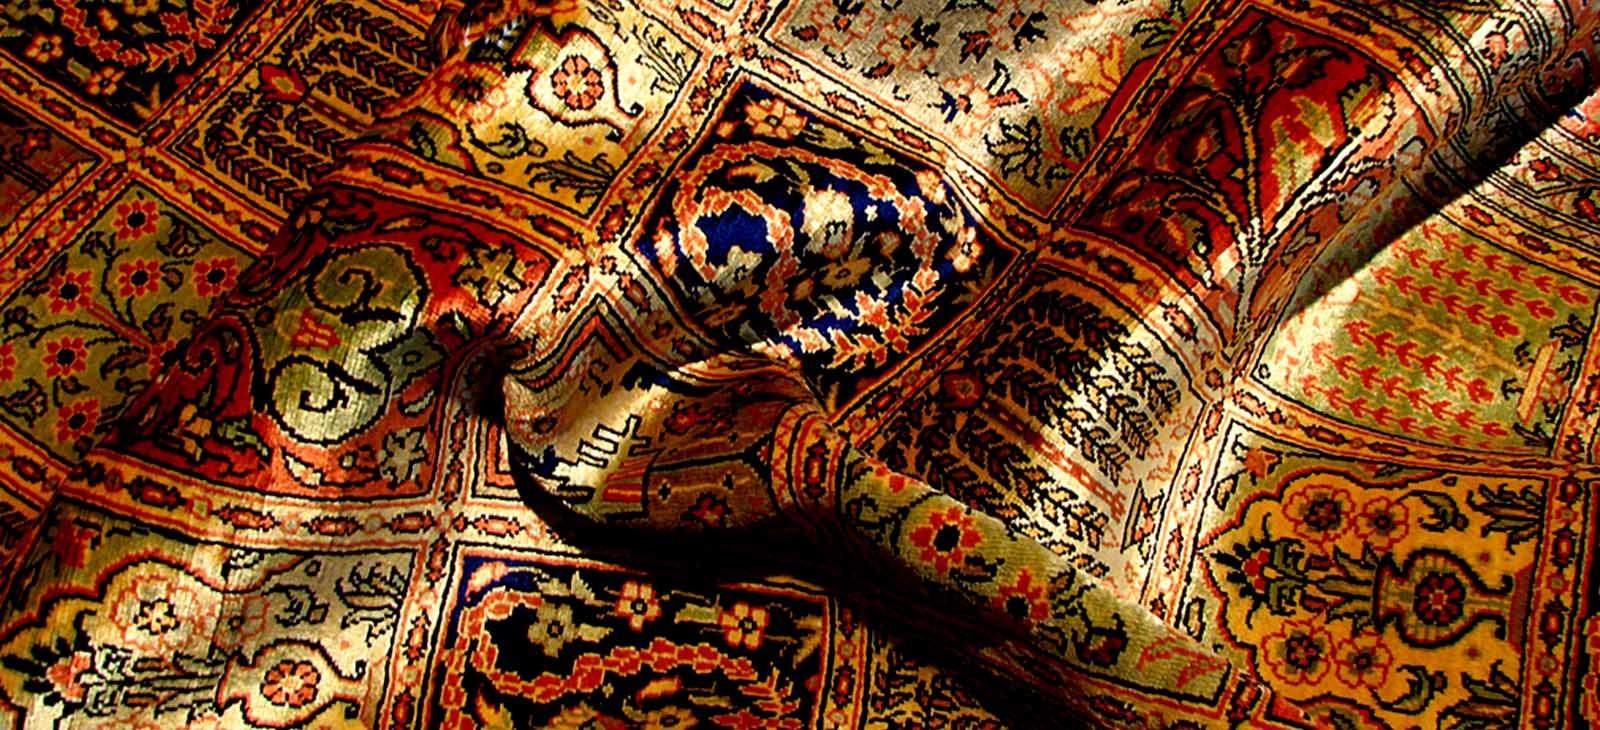 Какие сувениры из Ирана привезти?